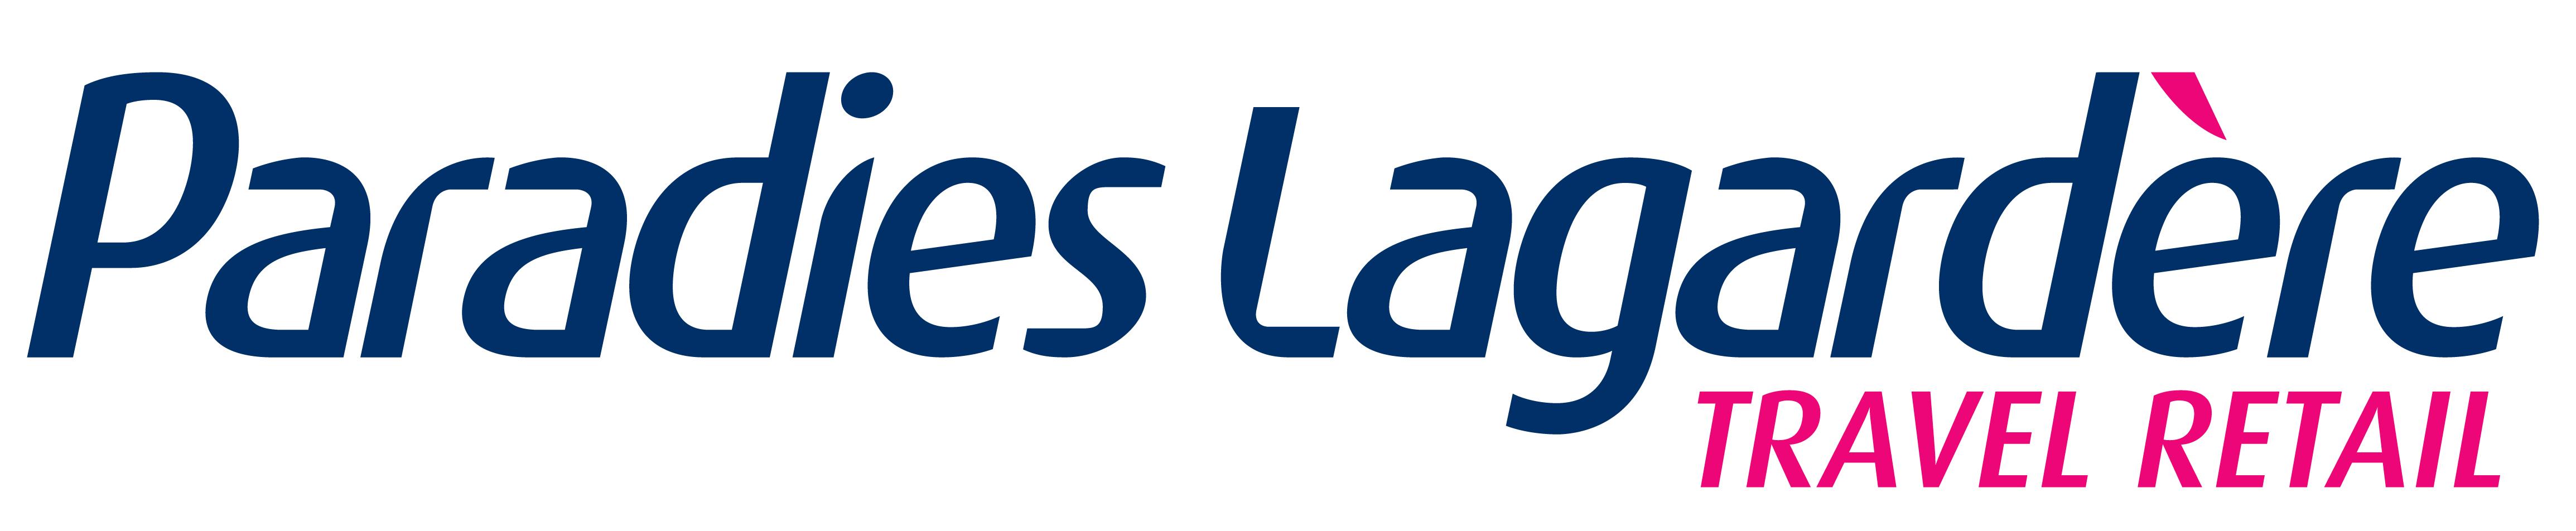 Topgun Sponsor - Paradies Lagardere - Logo